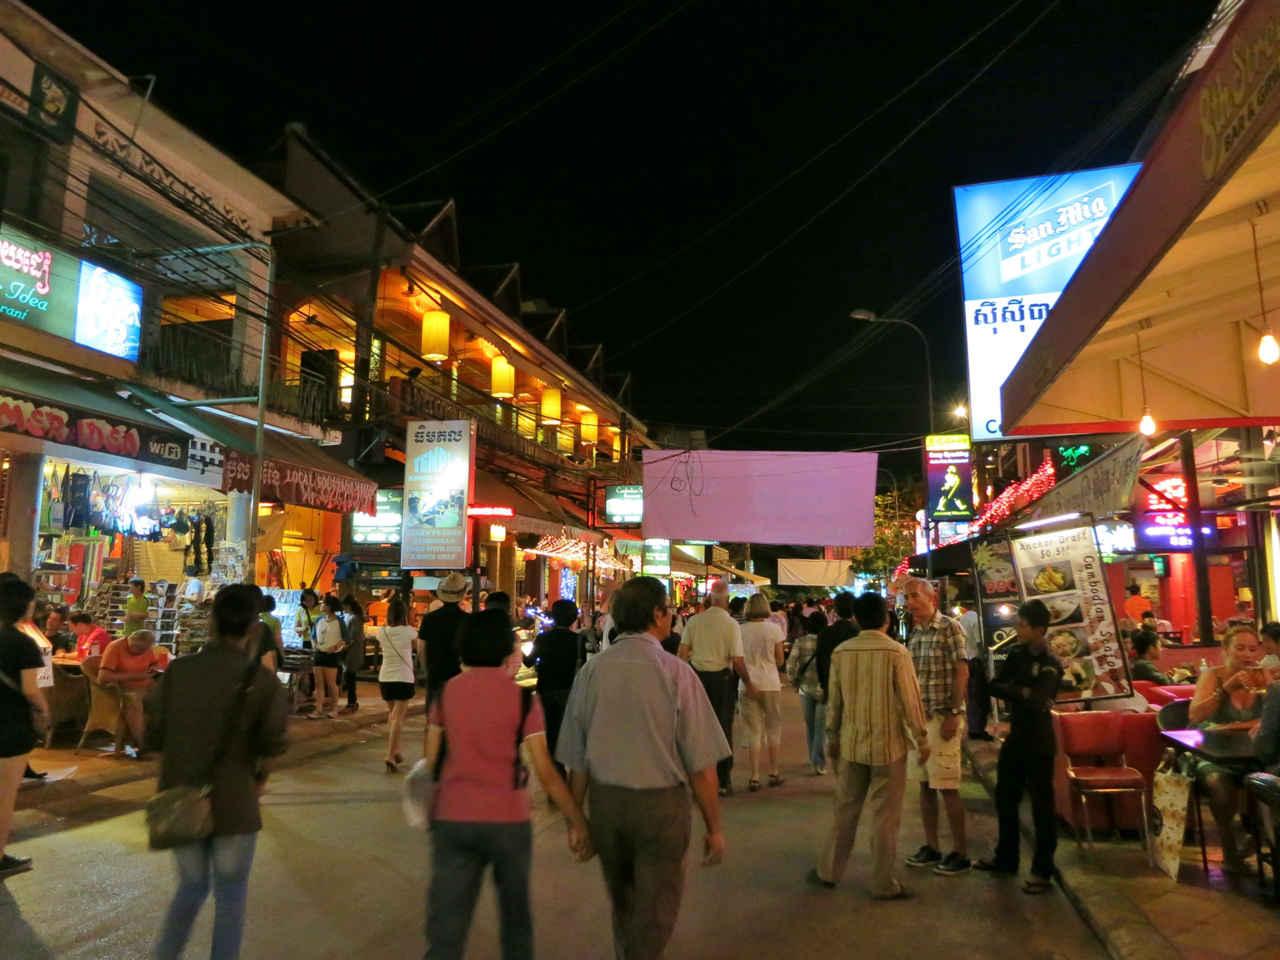 The main street in Siem Reap